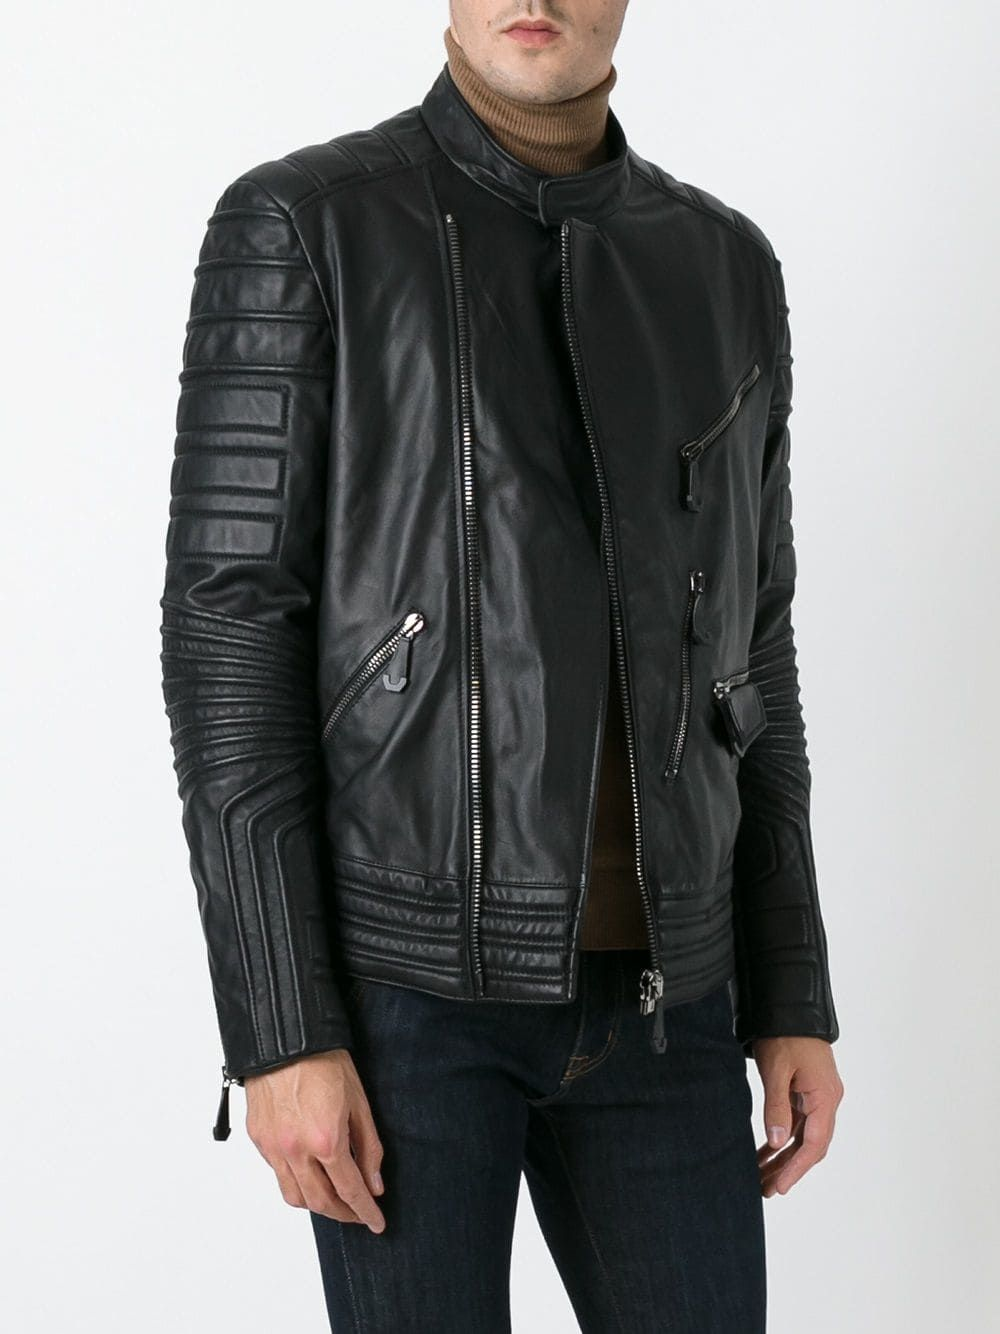 Philipp Plein Ribbed Panel Biker Jacket Mens Leather Bomber Jacket Biker Jacket Leather Bomber Jacket [ 1334 x 1000 Pixel ]